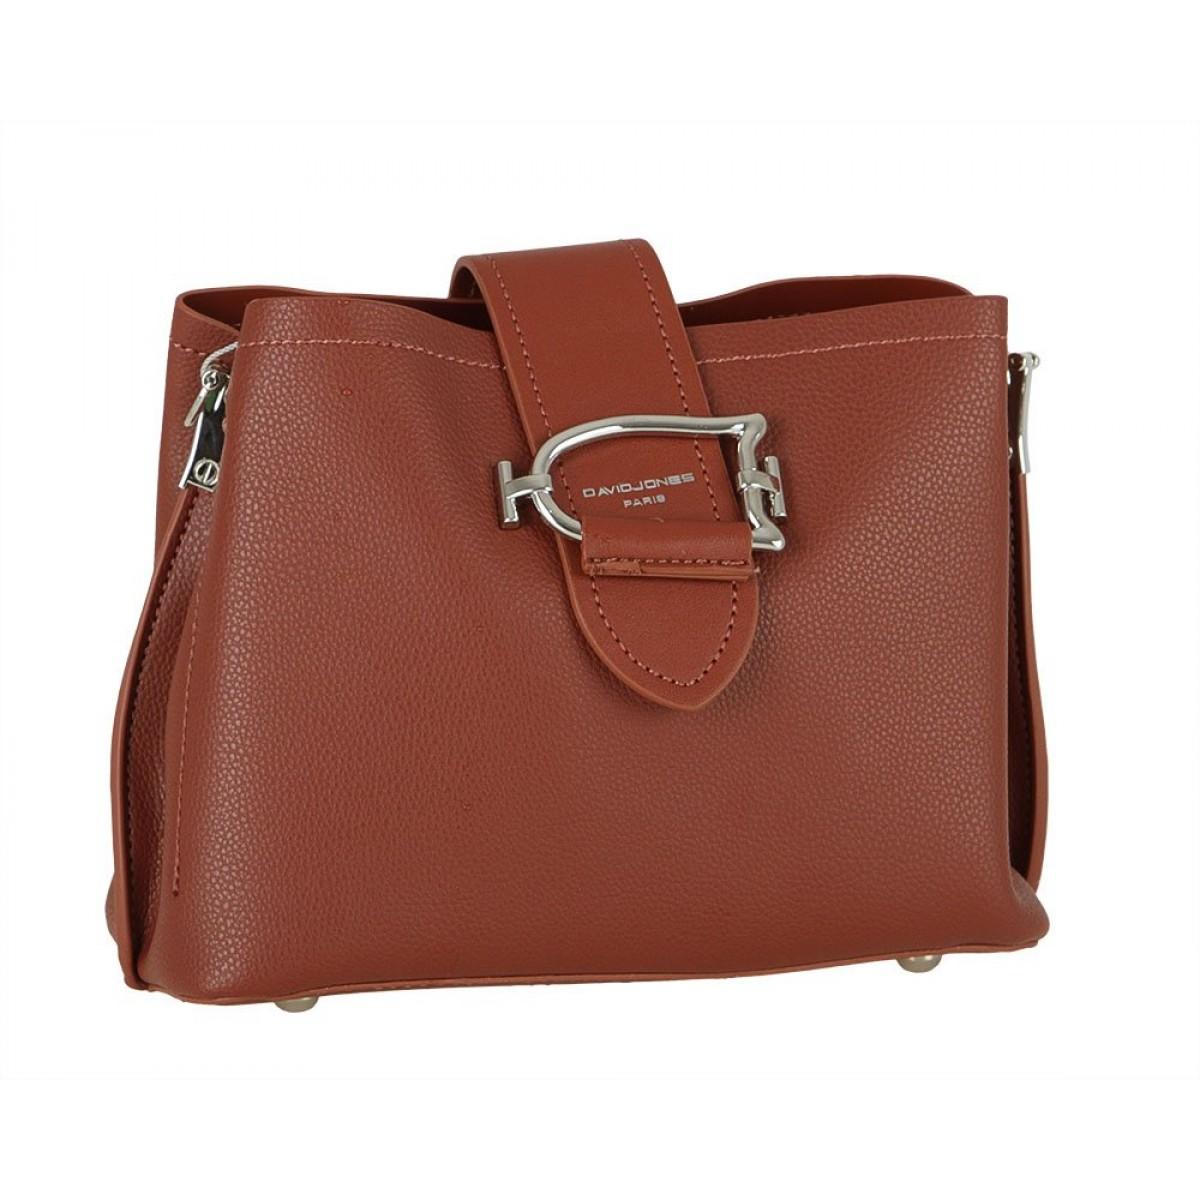 Жіноча сумка David Jones 6403-1 BROWN